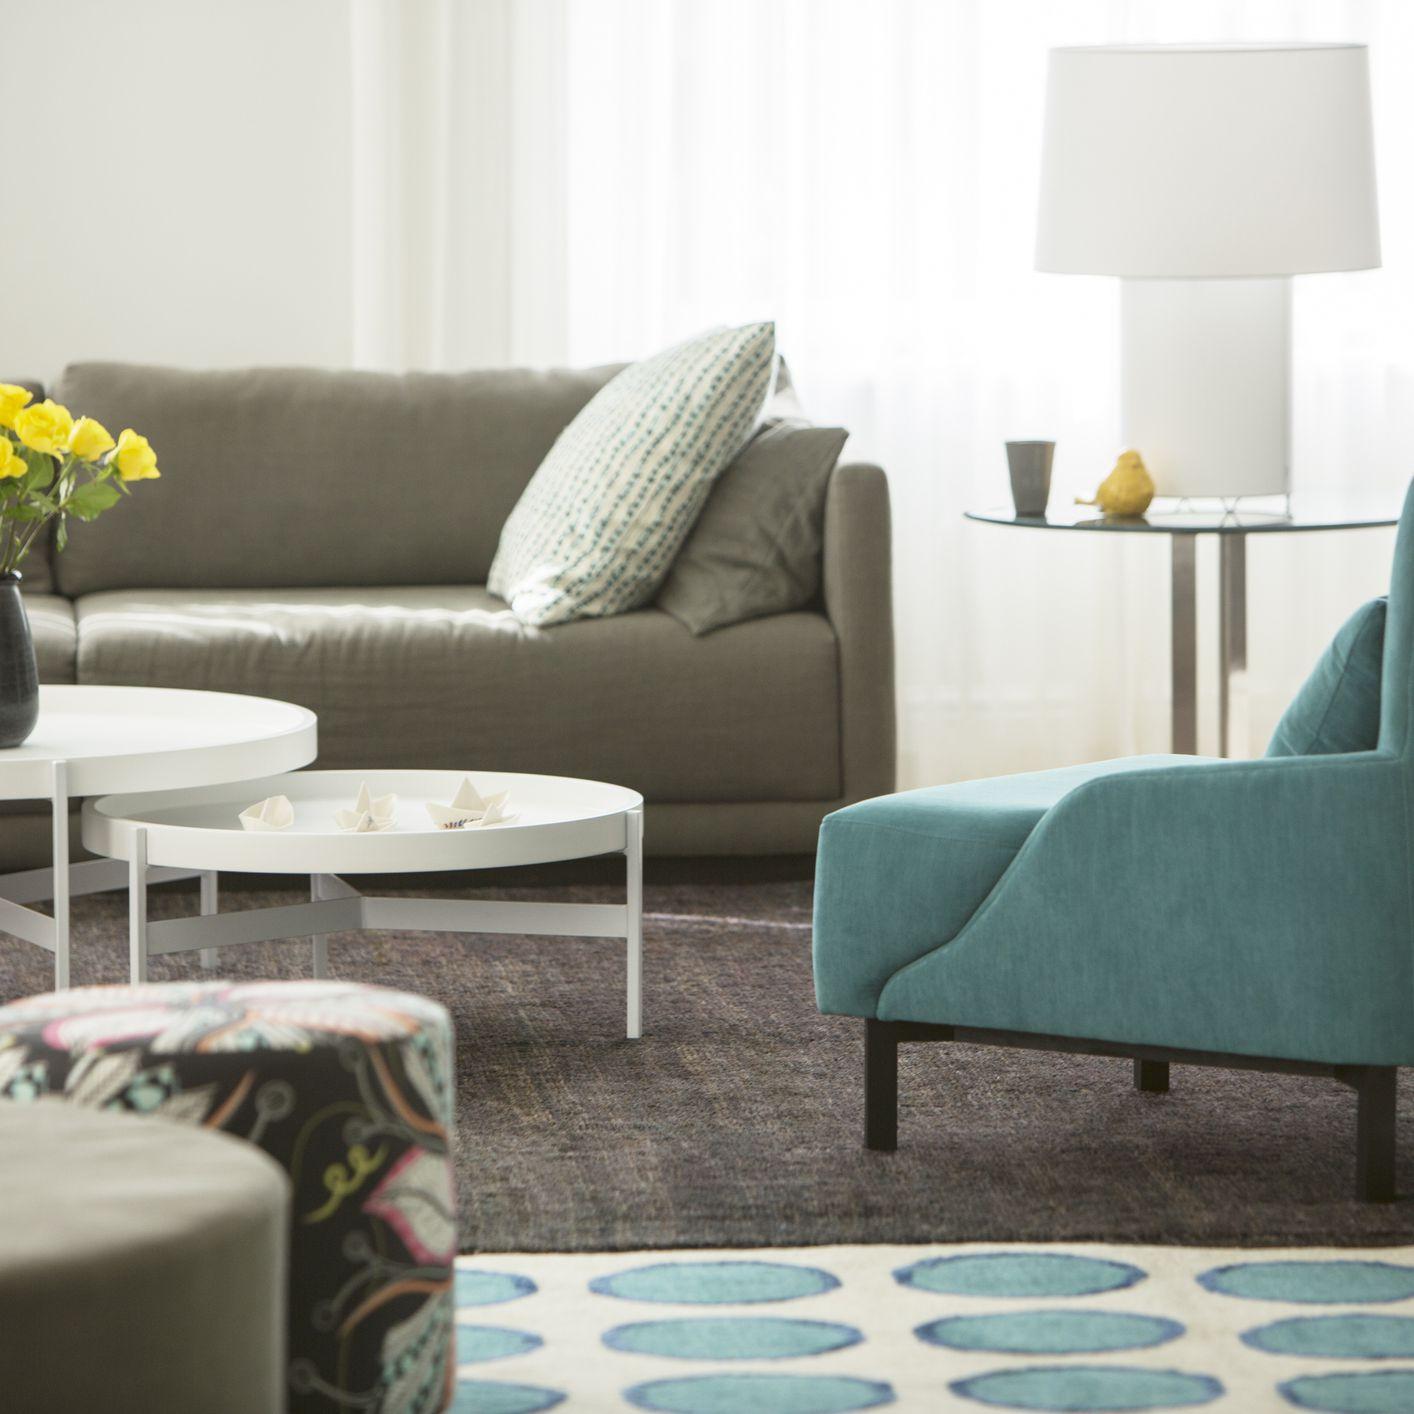 نتيجة بحث الصور عن Color coordination for decoration and furniture